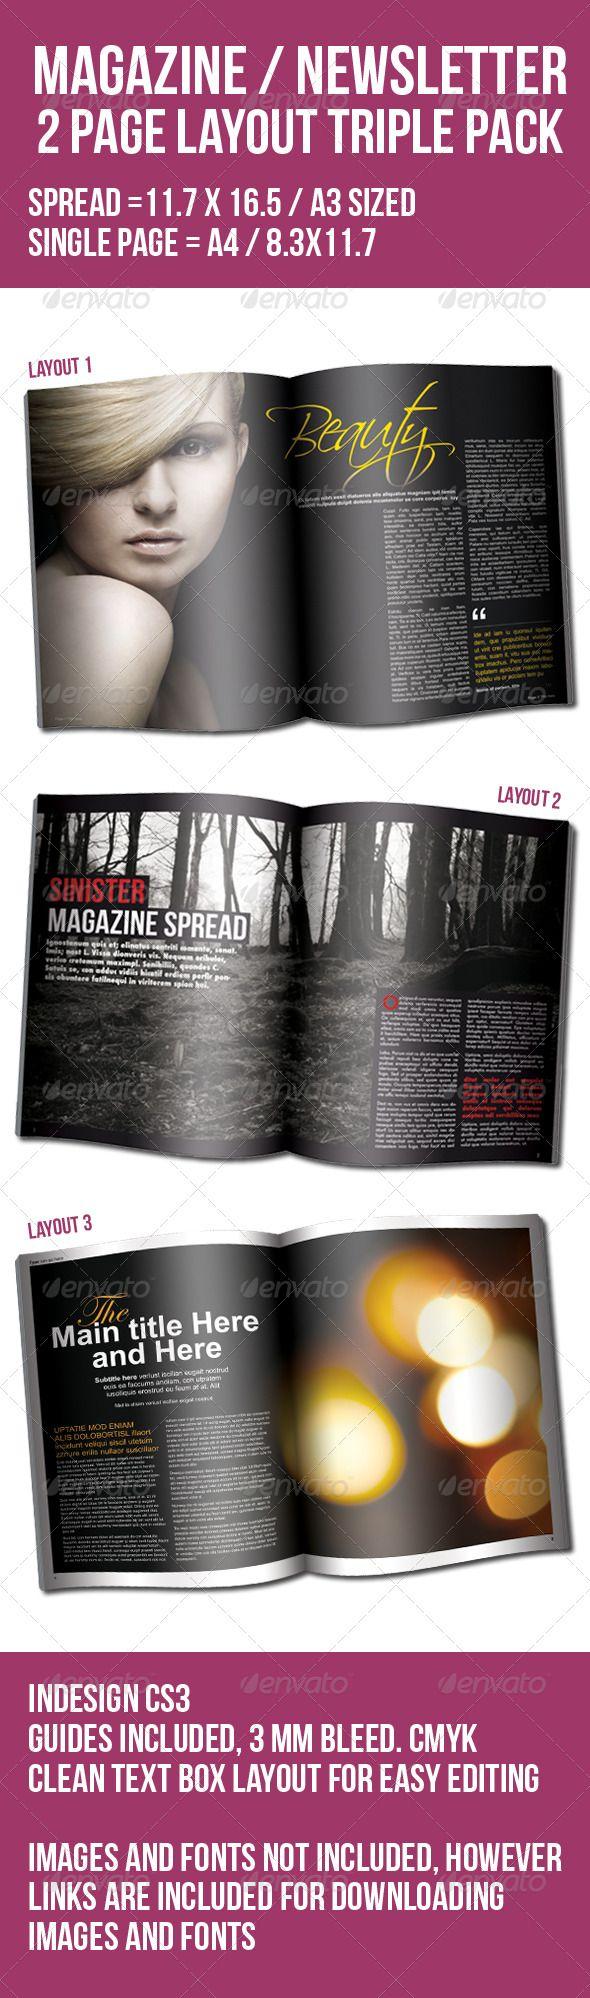 2 Page Layout Magazine /Newsletter Triple Pack | Pinterest | Layouts ...